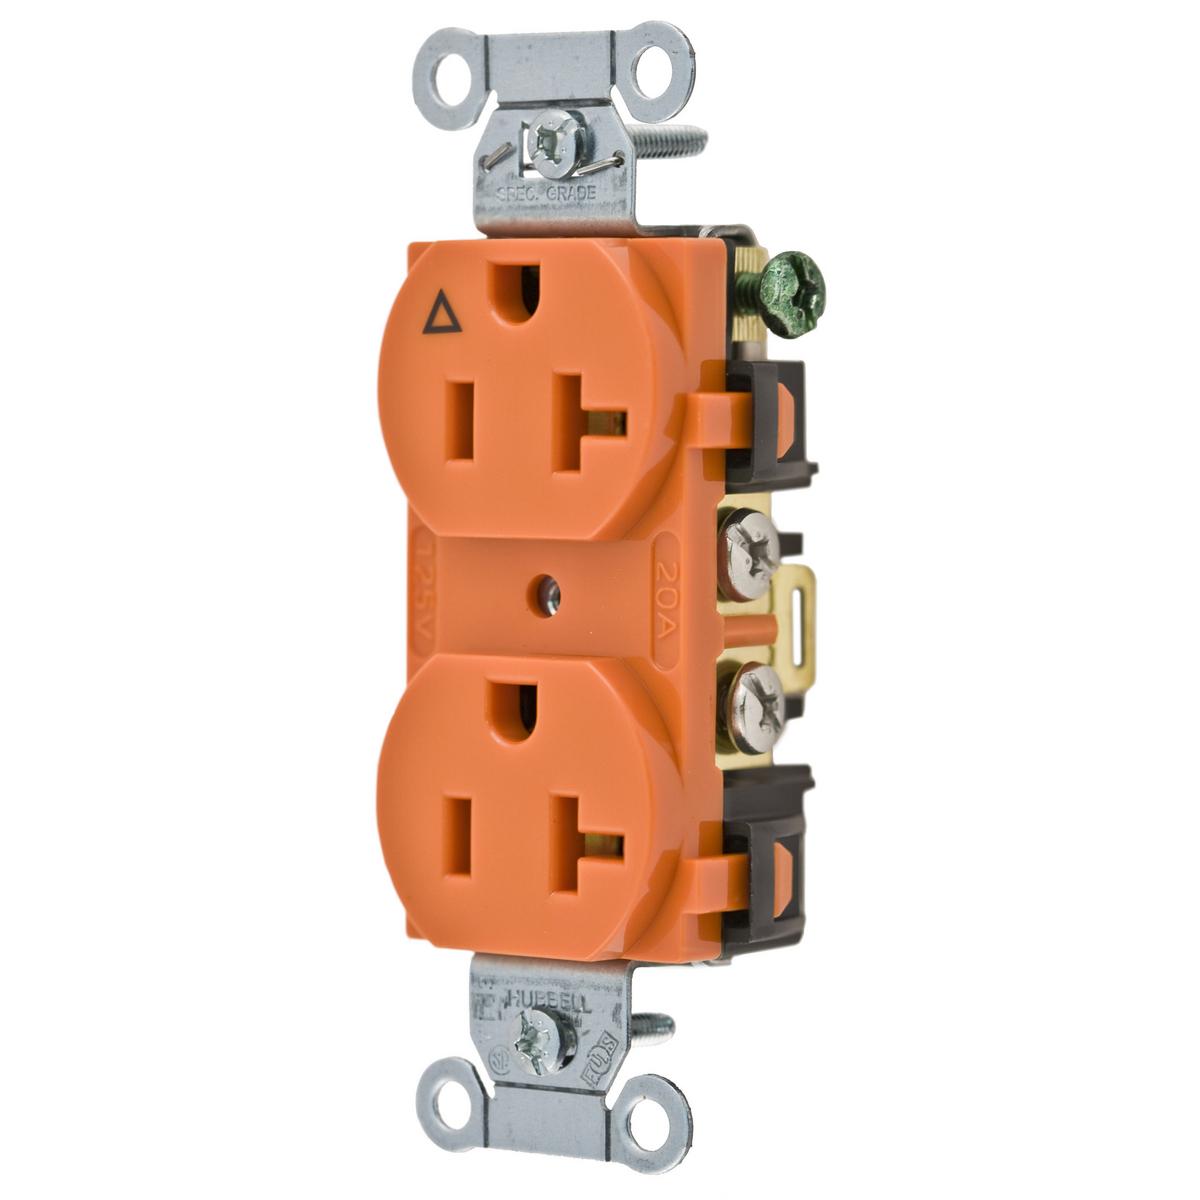 Hubbell IG20CR 20 Amp 125 Volt 2-Pole 3-Wire NEMA 5-20R Orange Isolated Ground Straight Blade Duplex Receptacle